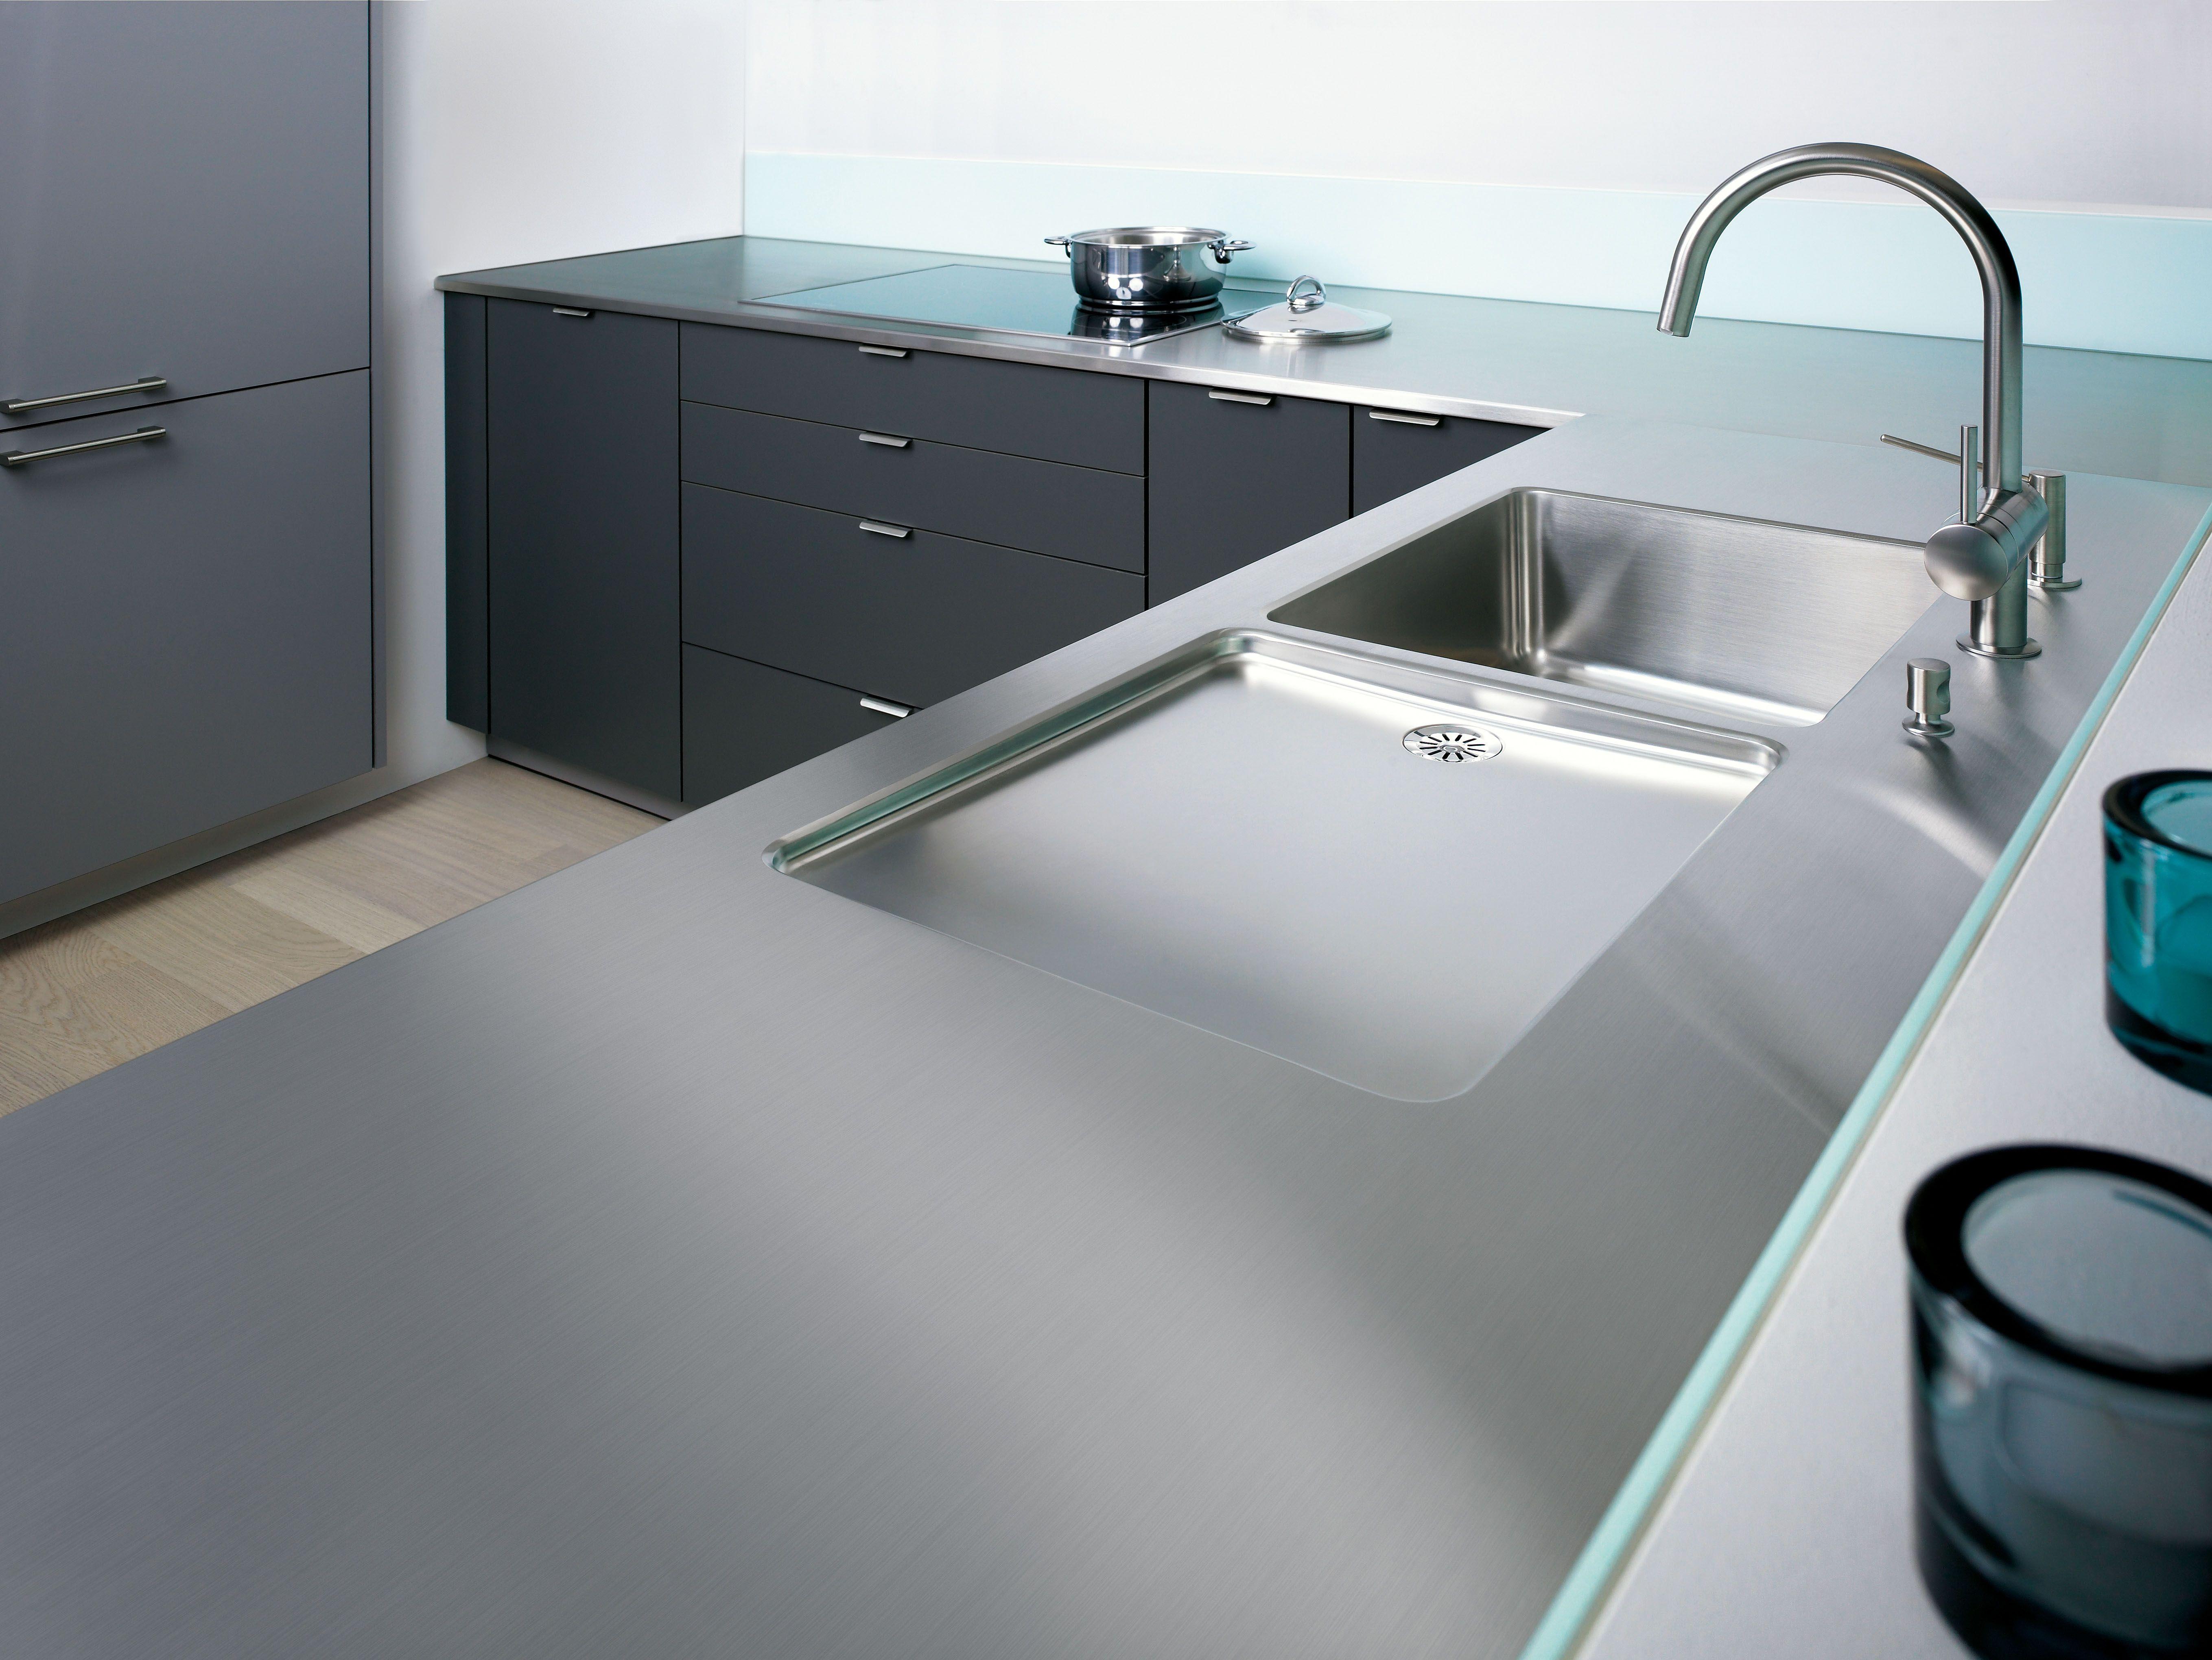 4mm Massive Stainless Steel Countertop From Franke / 4mm Massief RVS  Werkblad Van Franke